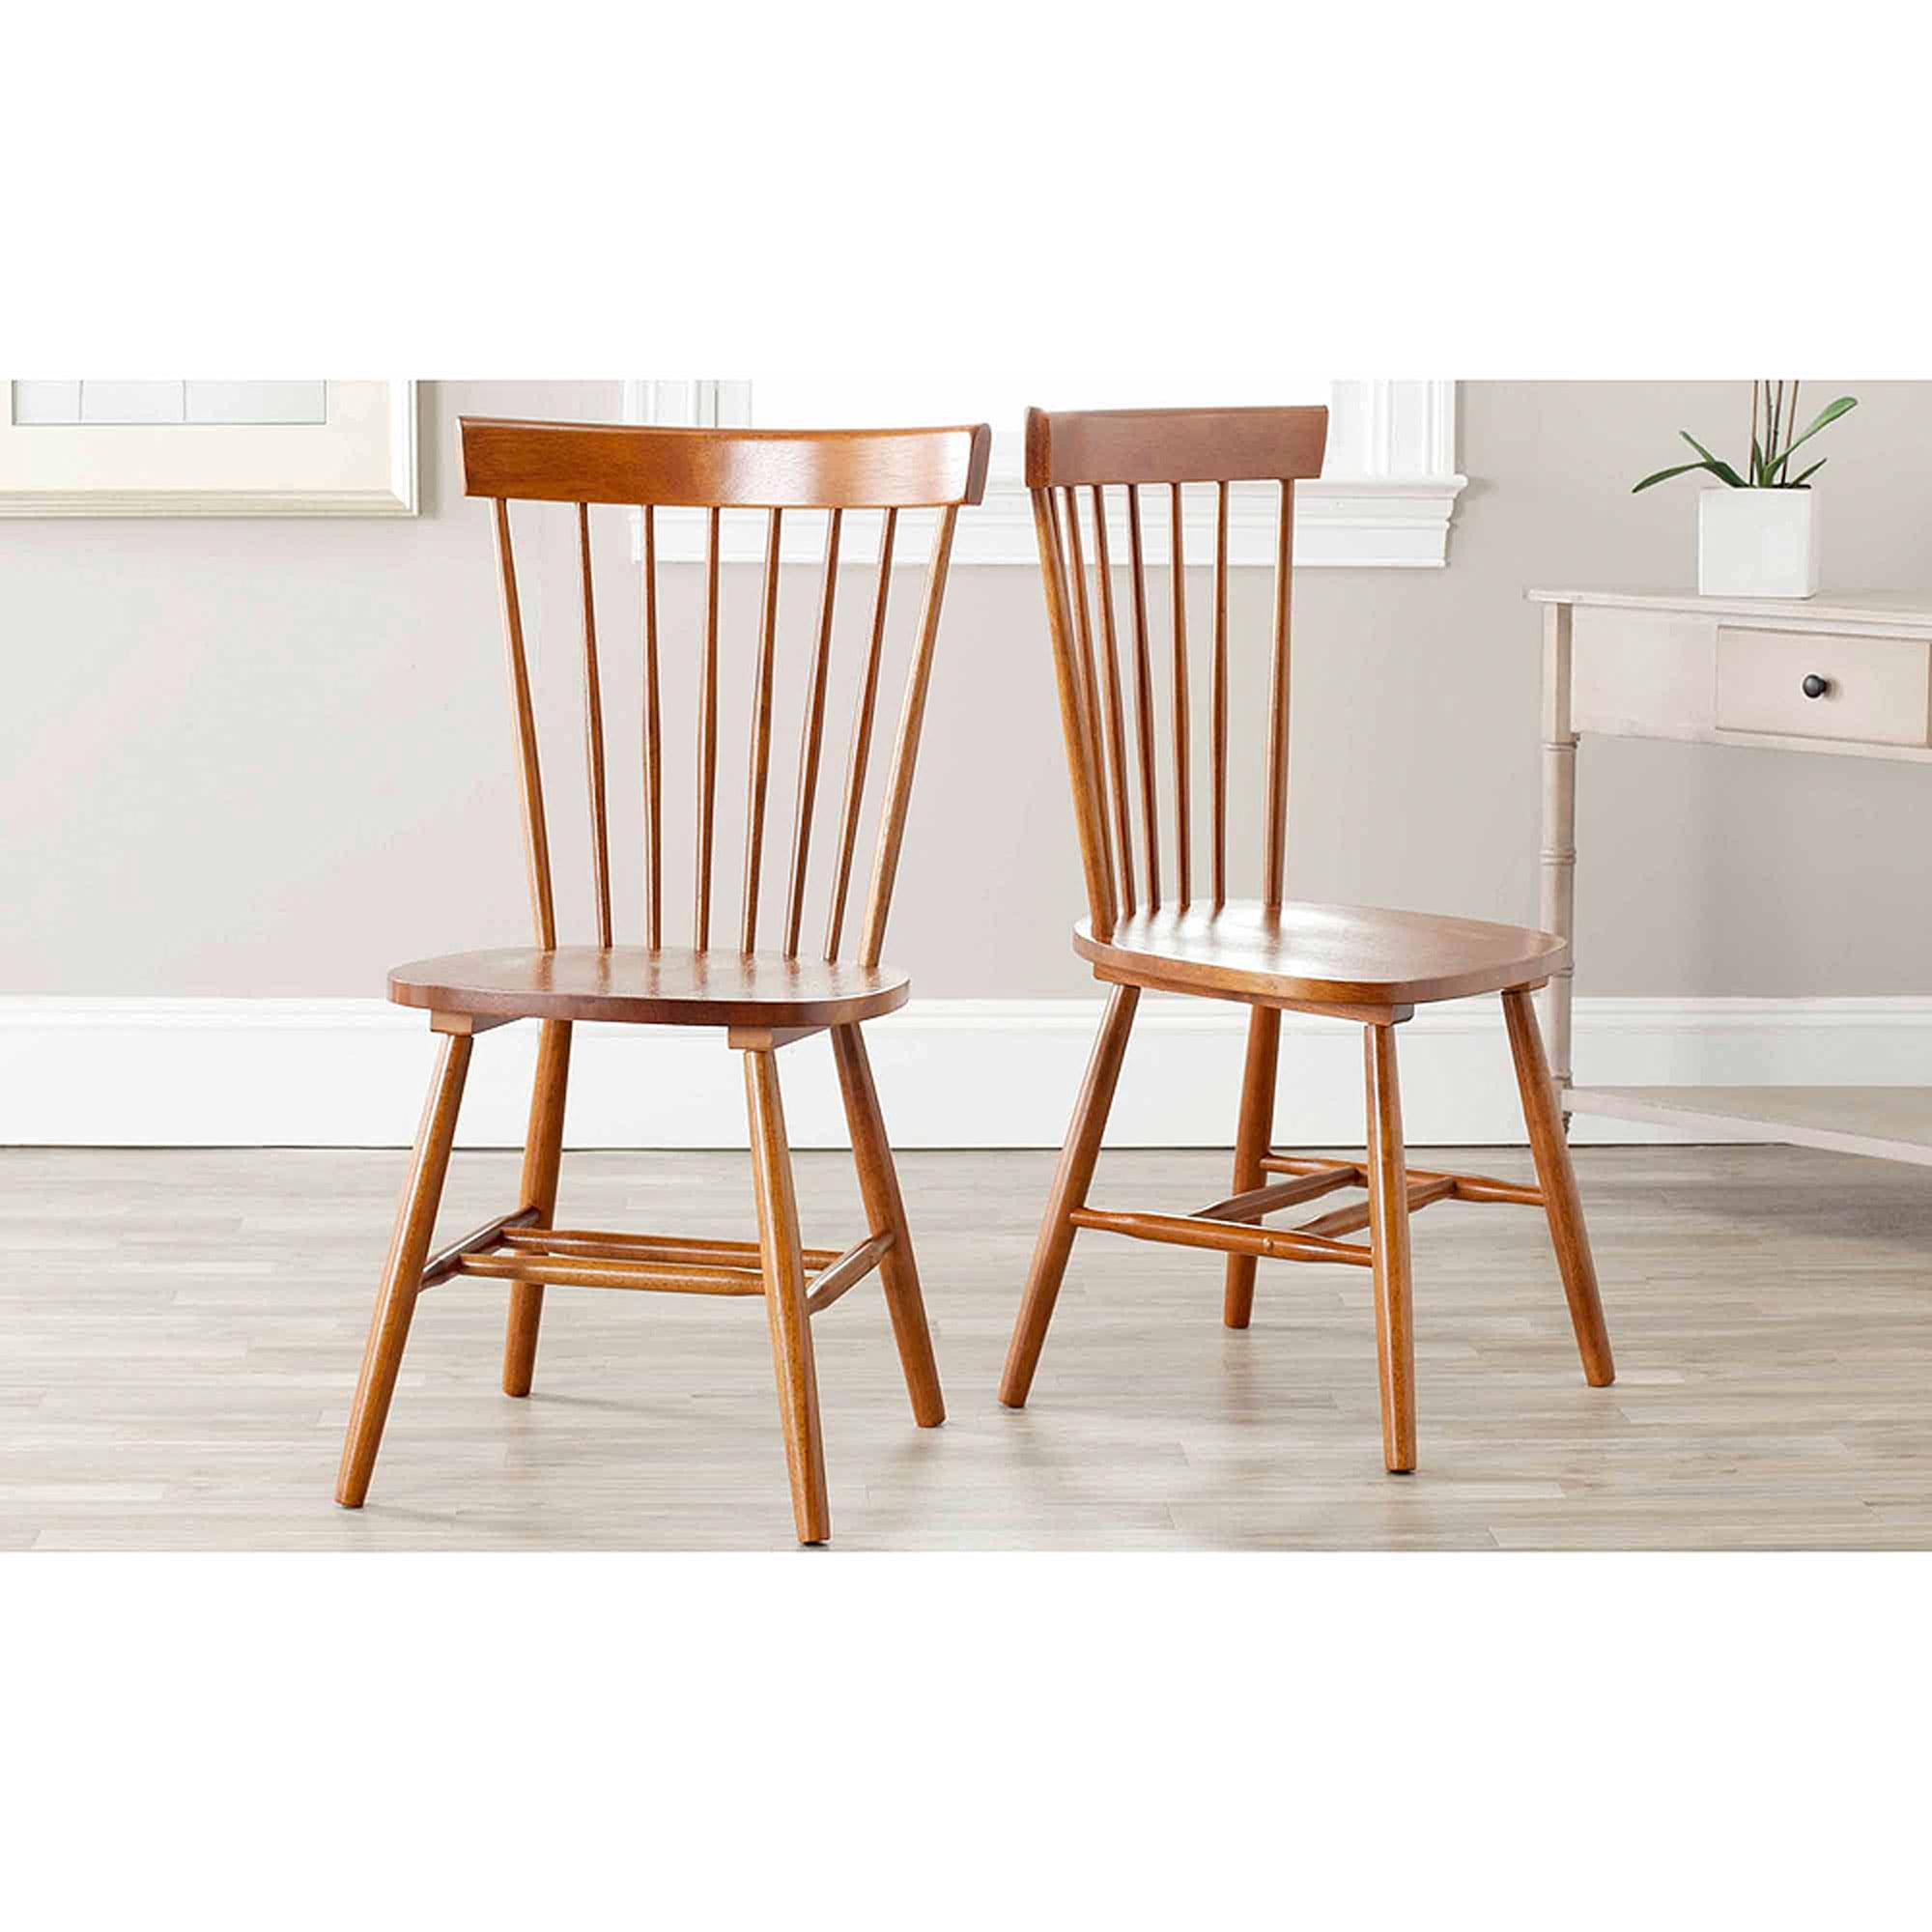 Safavieh Parker Side Chair, Set of 2